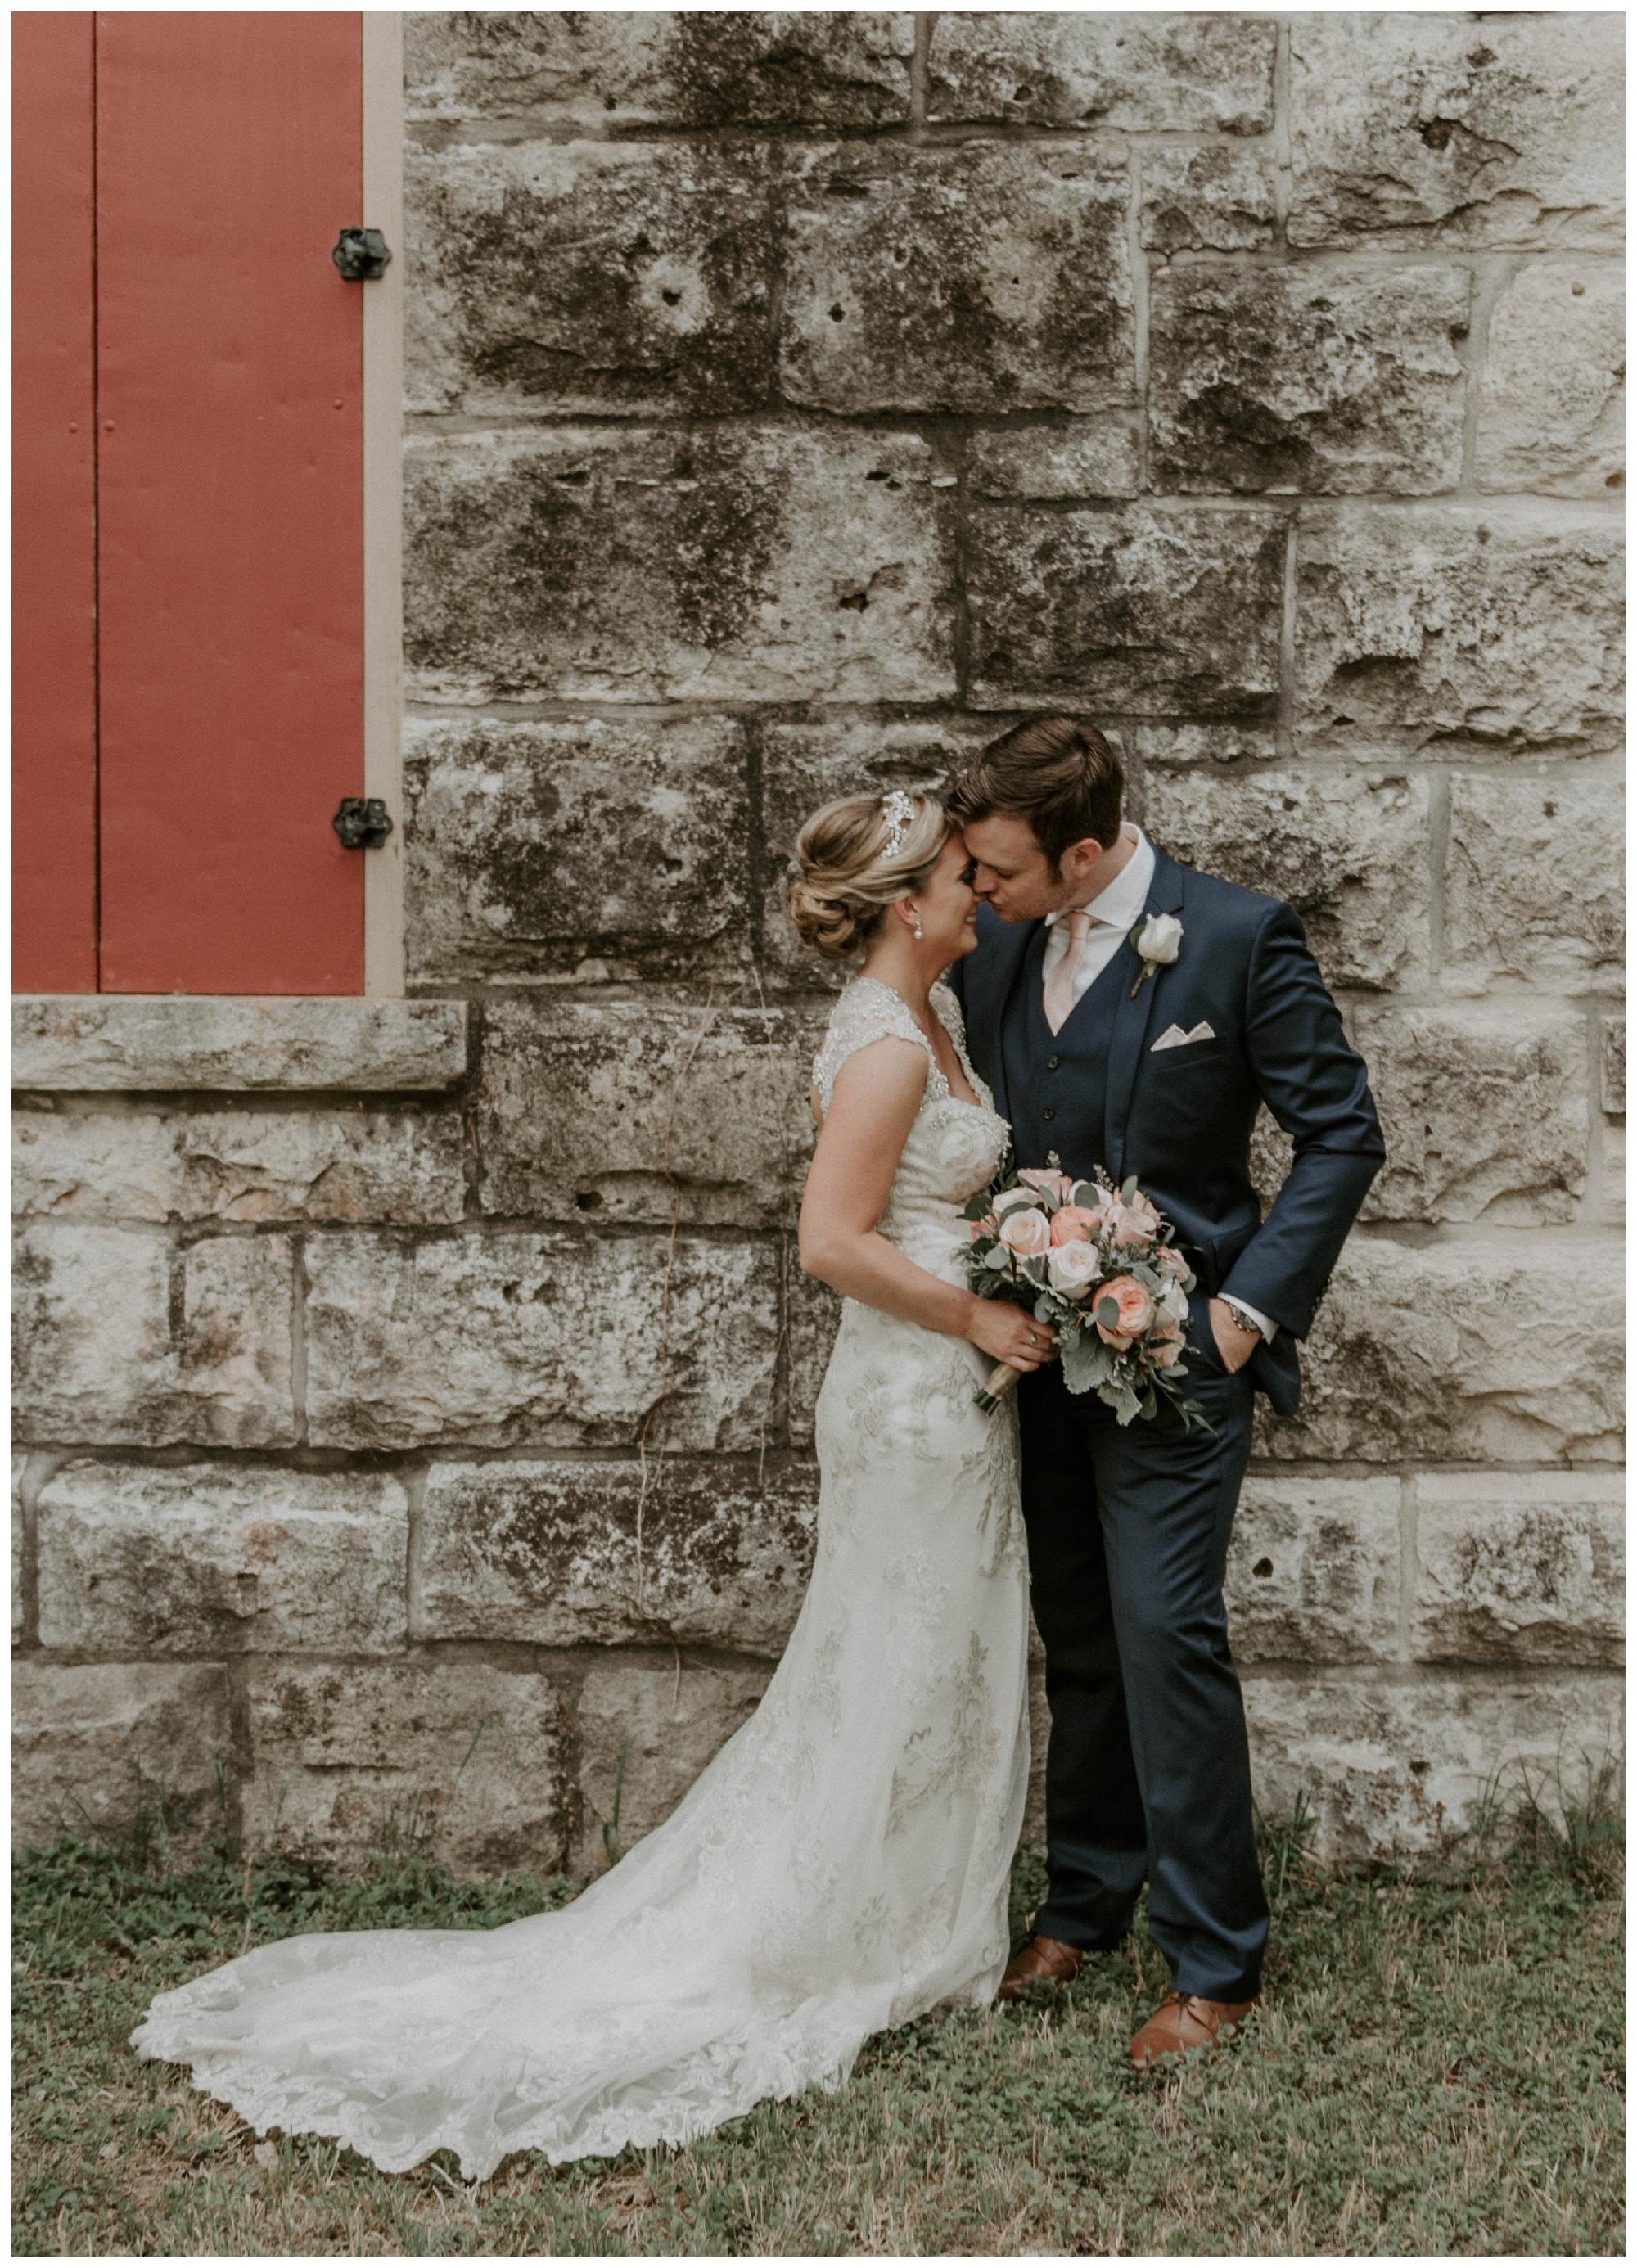 austin-texas-wedding-photography-1778-photographie_0097.jpg